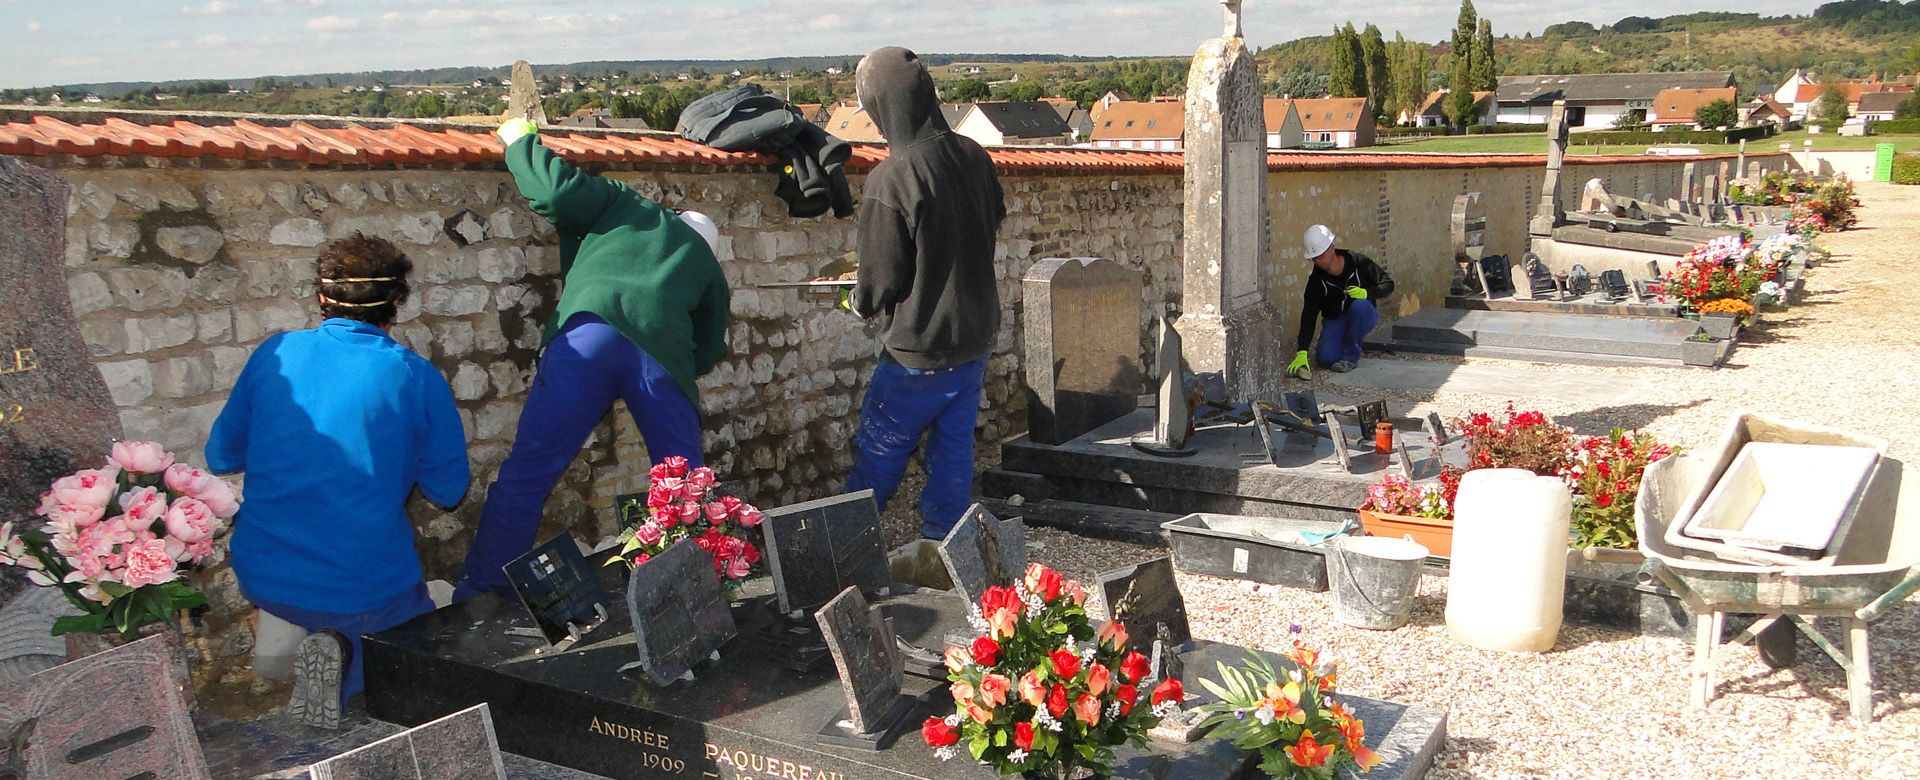 Sauvegarder le patrimoine en Seine-Eure